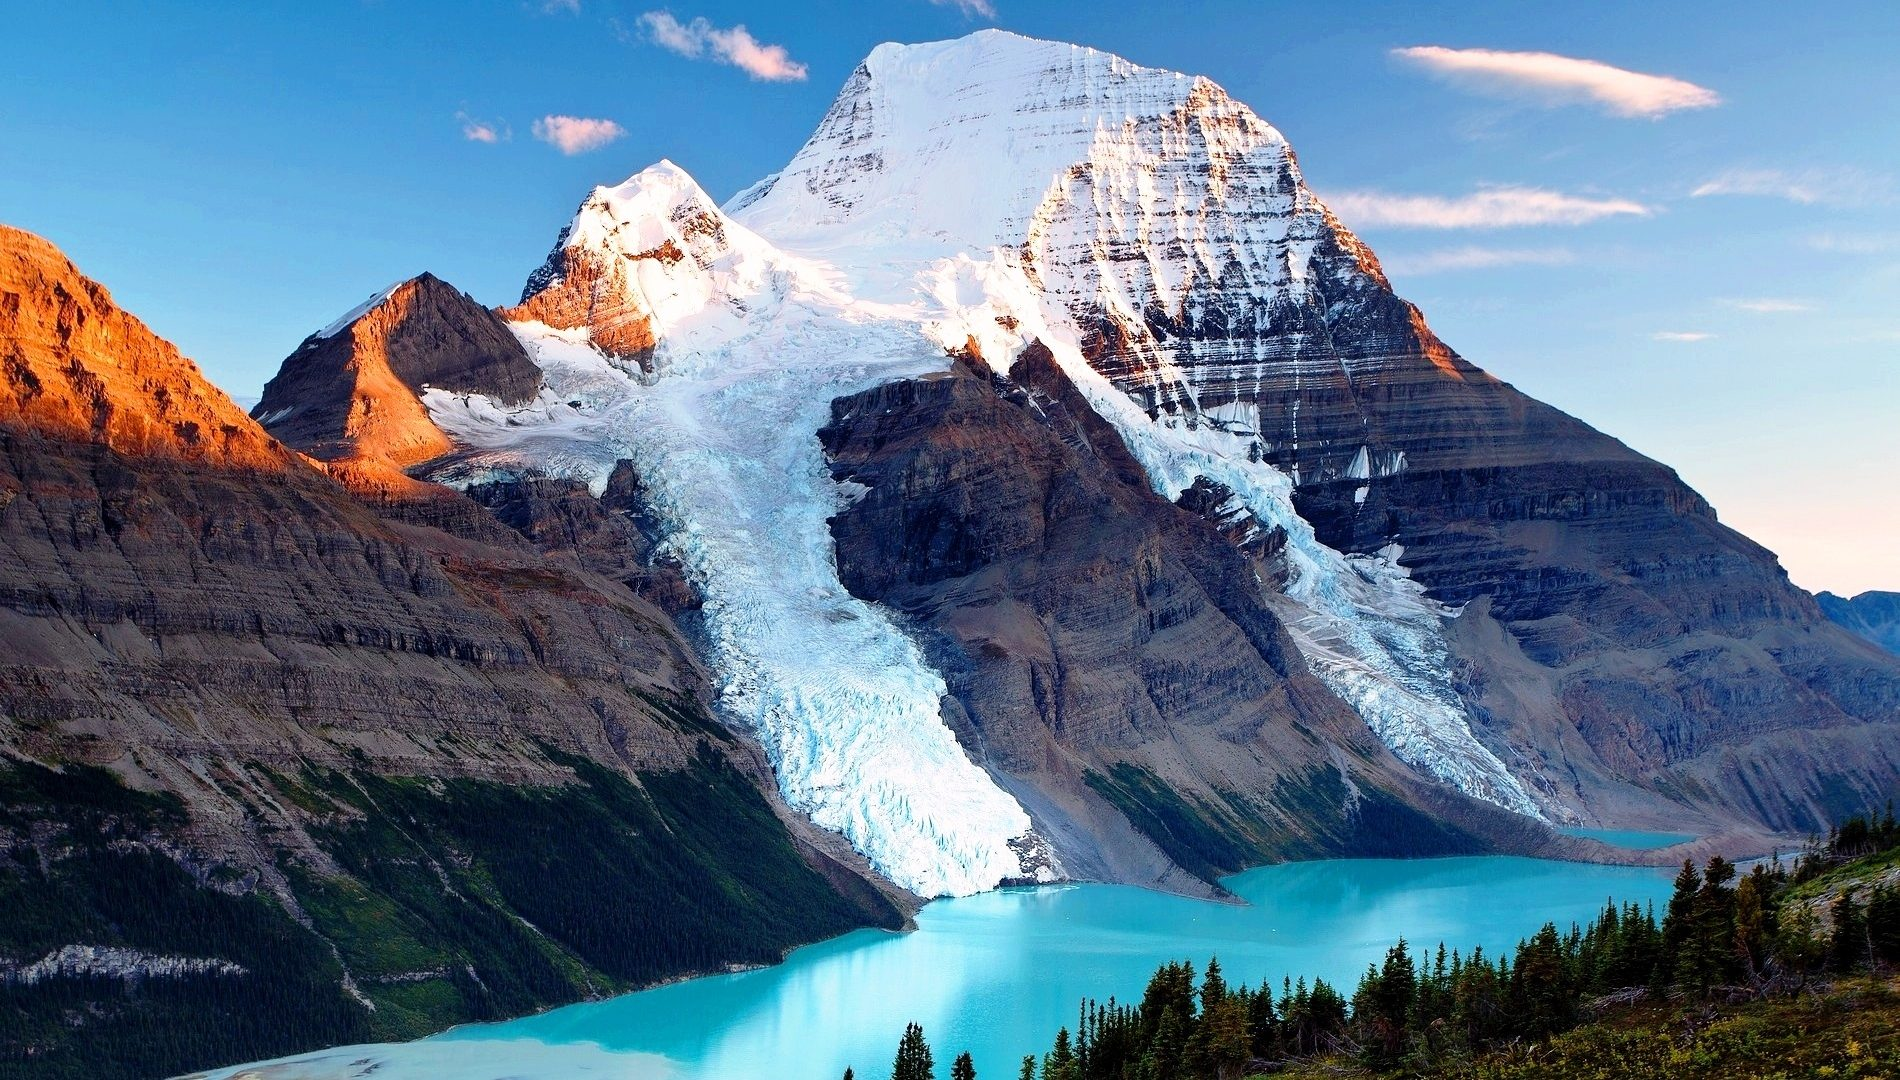 Fall Season Computer Wallpaper Everest Backgrounds Free Download Pixelstalk Net